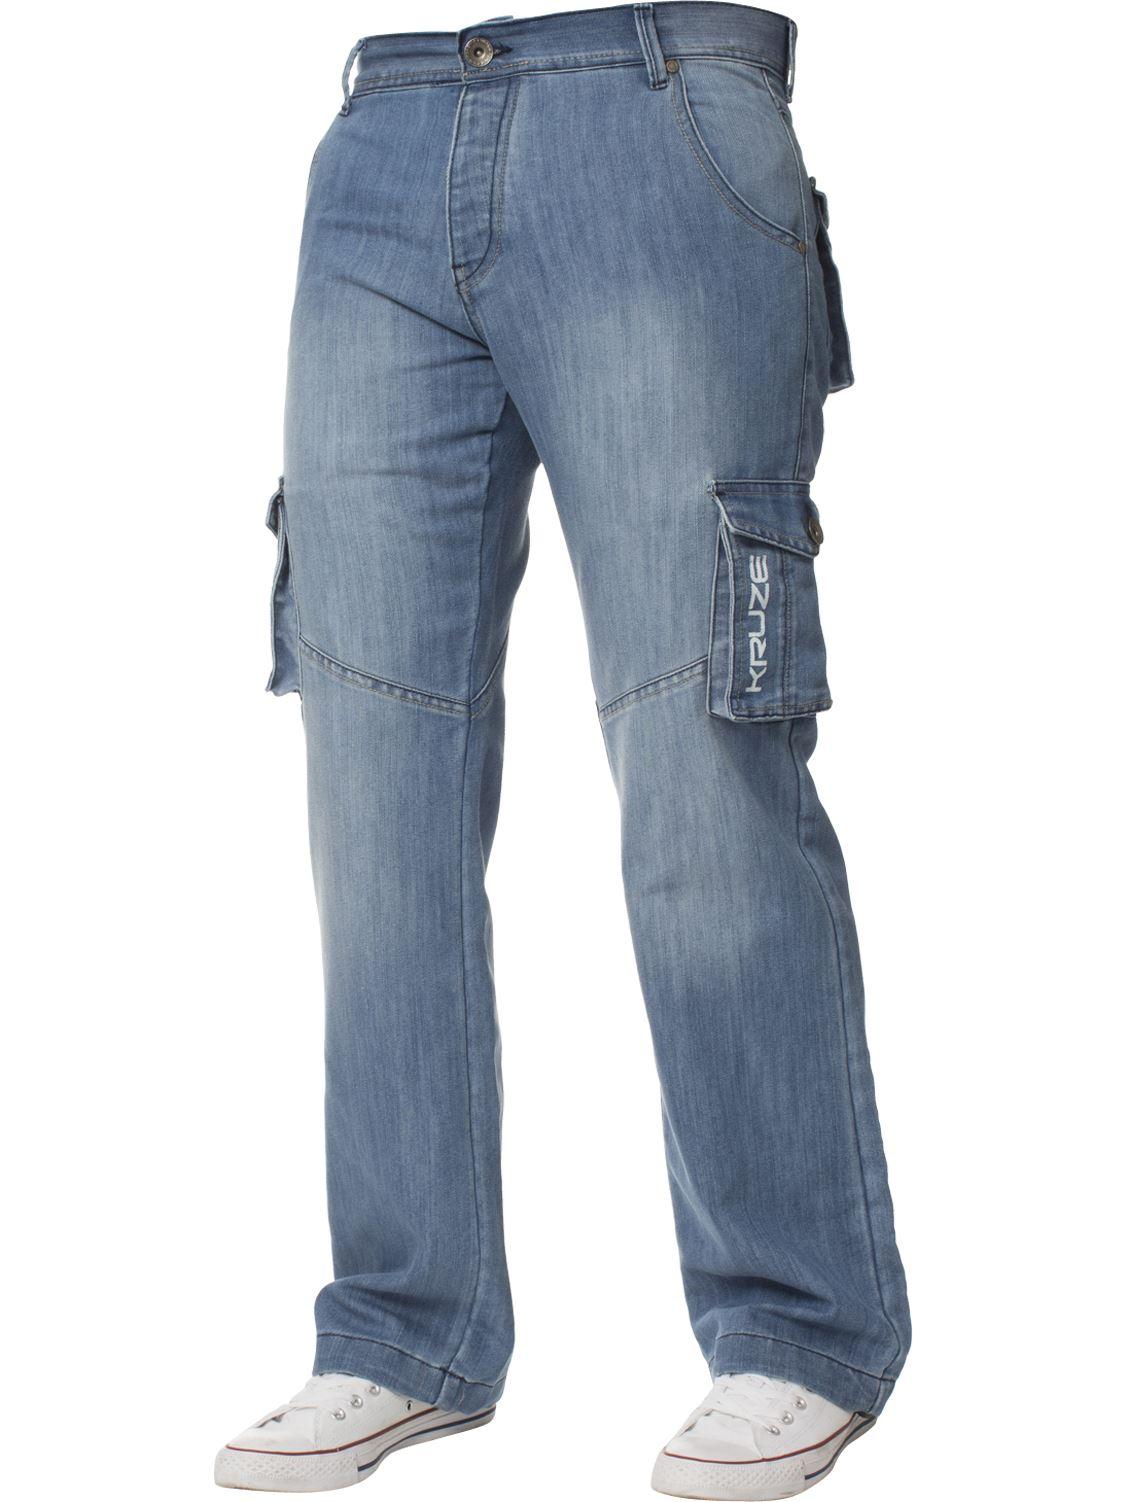 Grandes-jeans-para-hombre-de-combate-de-Kruze-Rey-Alto-Pierna-Cargo-Pantalones-Jeans-Pantalones miniatura 29